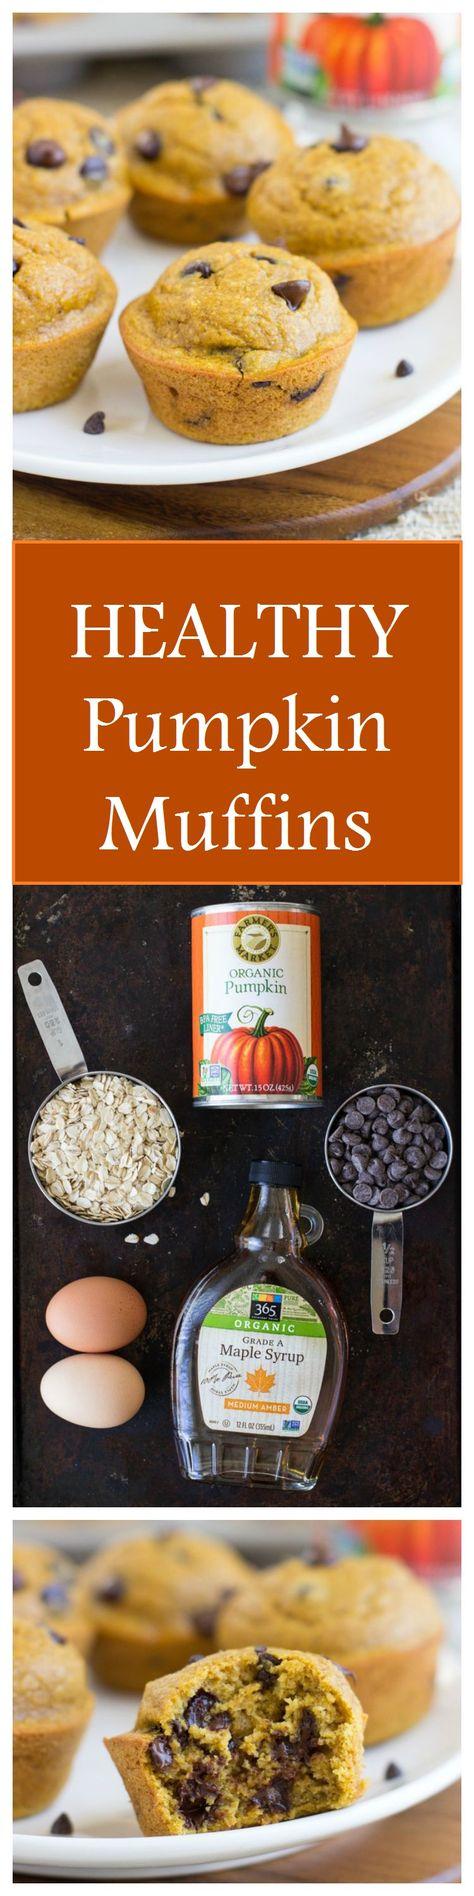 Healthy Flourless Pumpkin Muffins- made easy in a blender with wholesome ingredients! #dairyfree #glutenfree #refinedsugarfree